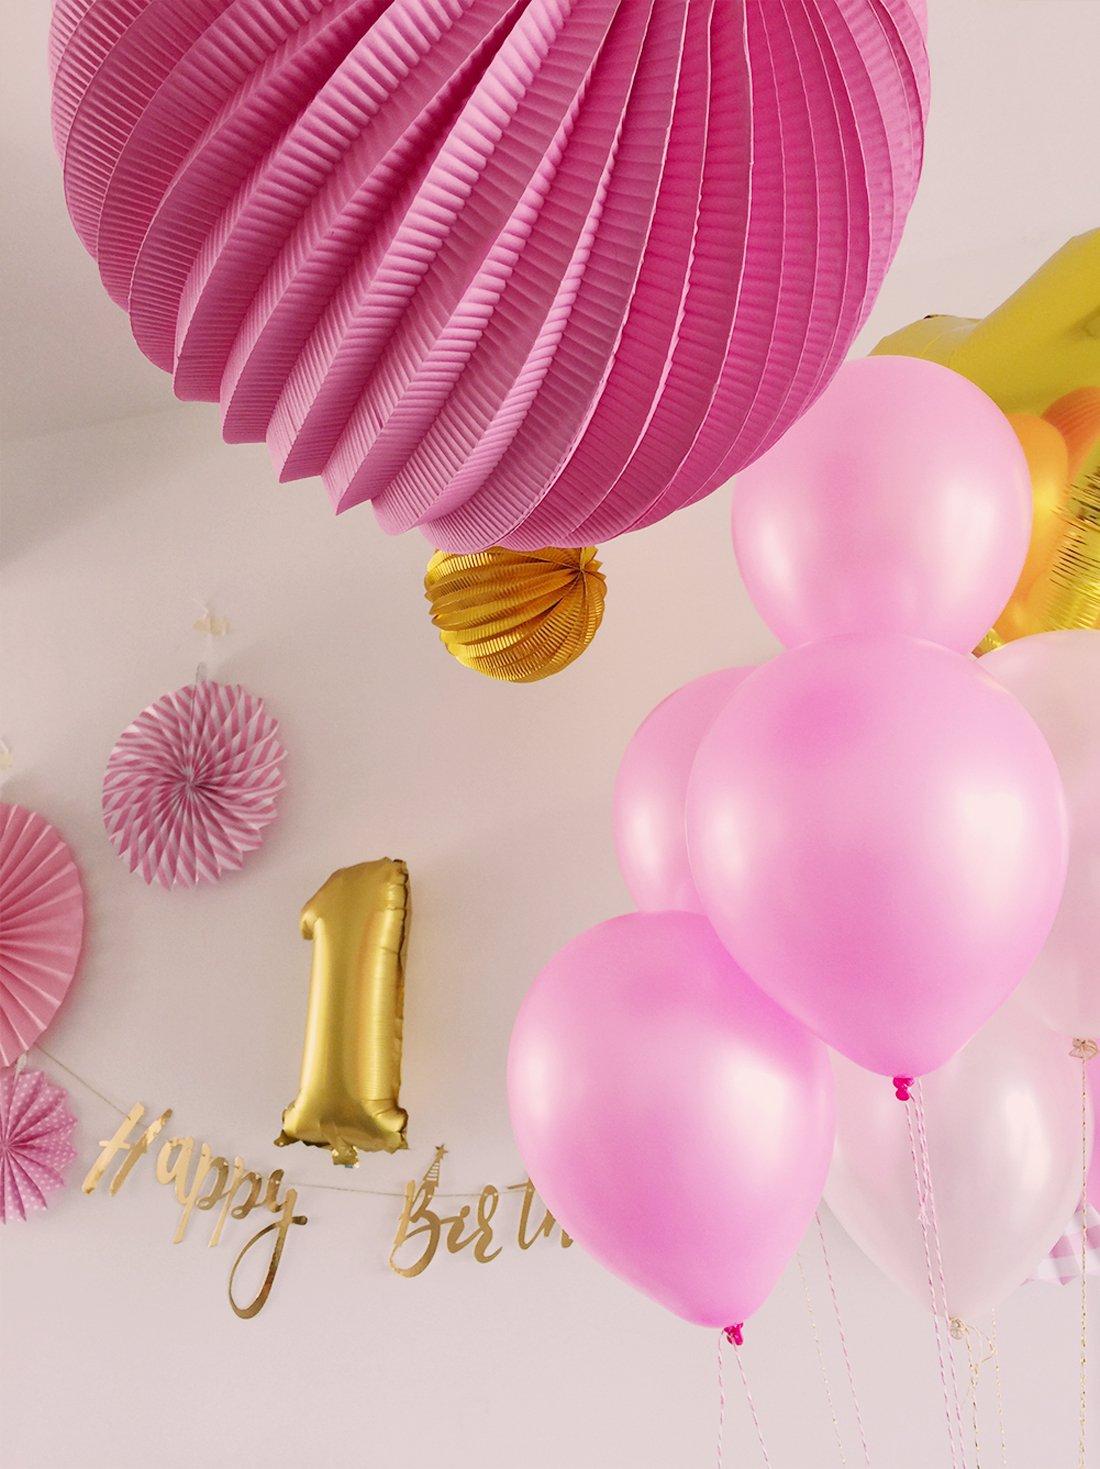 29pcs Easy Joy Anniversaire 1 an Fille Rose Ballon Decoration Anniversaire Fille Happy Birthday Banderole Or